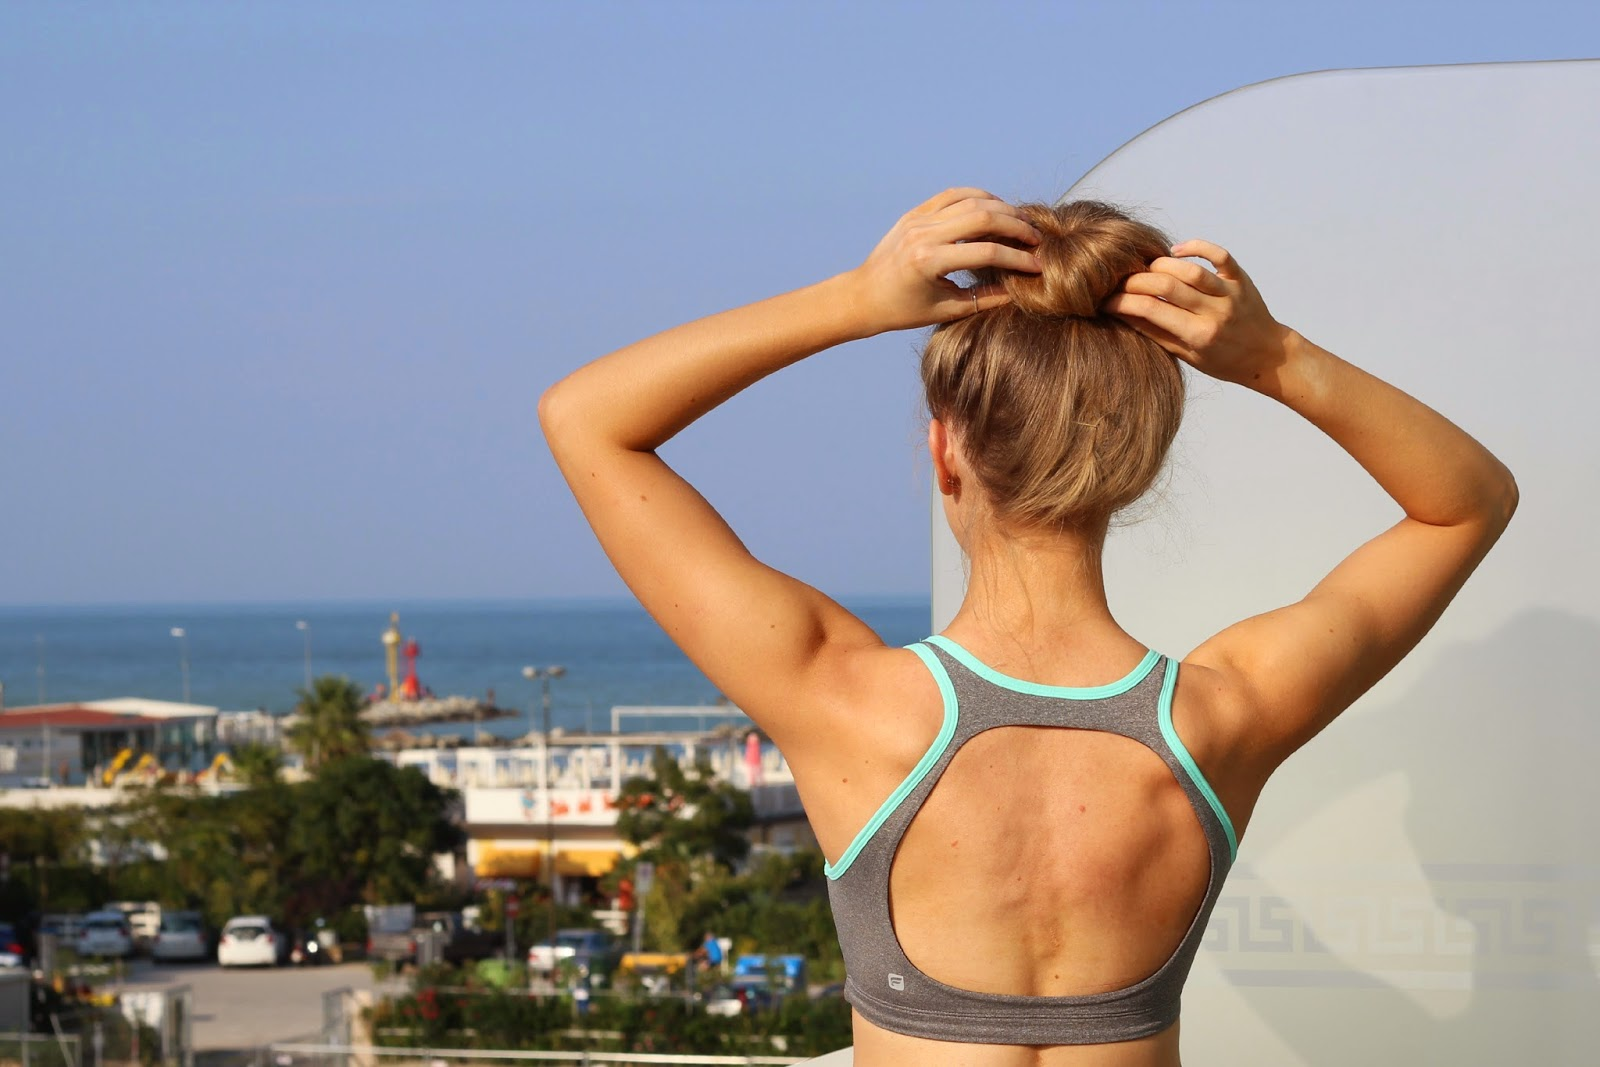 Fabletics Koia Sports Bra Back Blonde Fitness Girl